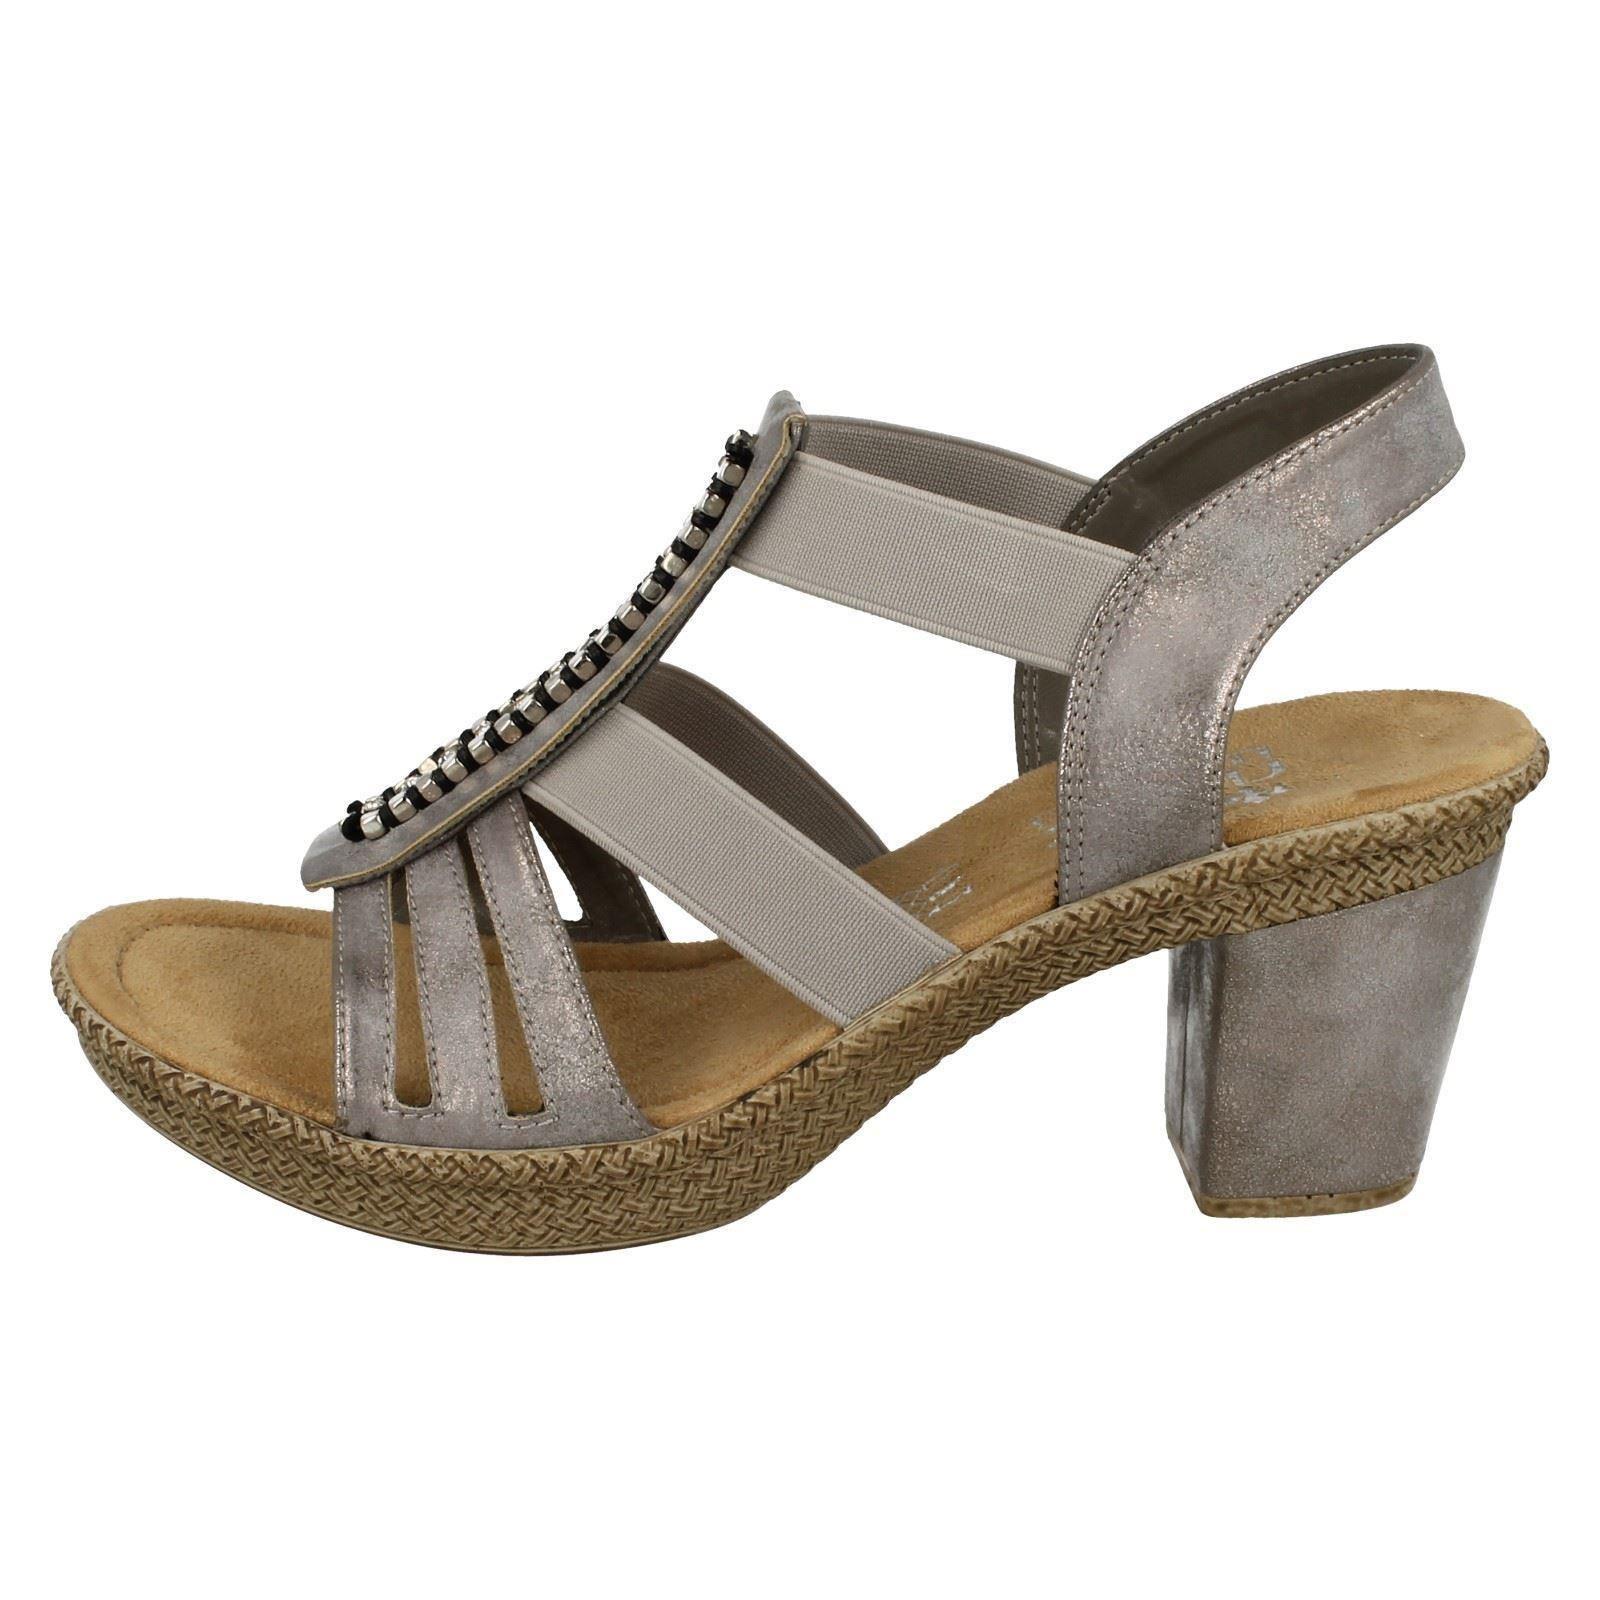 Ladies Rieker 66584 Heeled Sandals Sandals Sandals 5b00fe